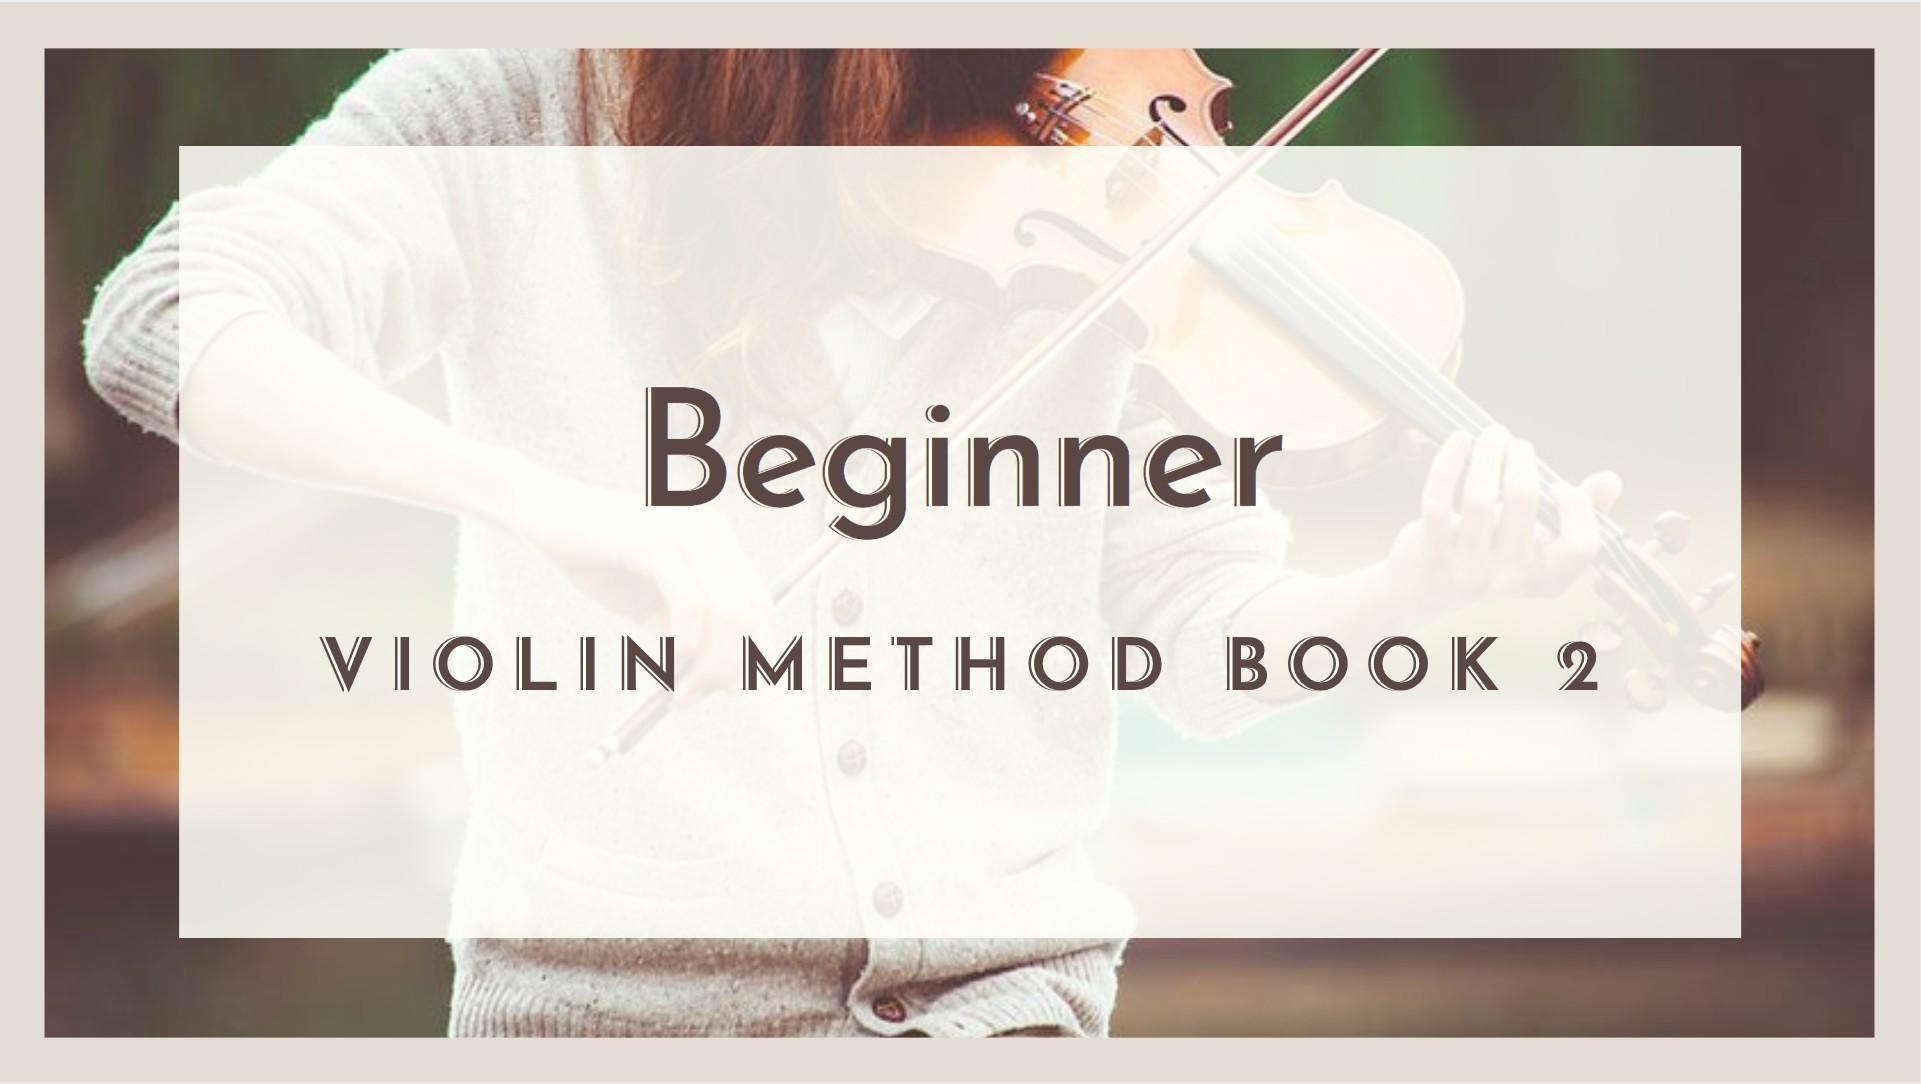 Beginner Violin Method Book 2